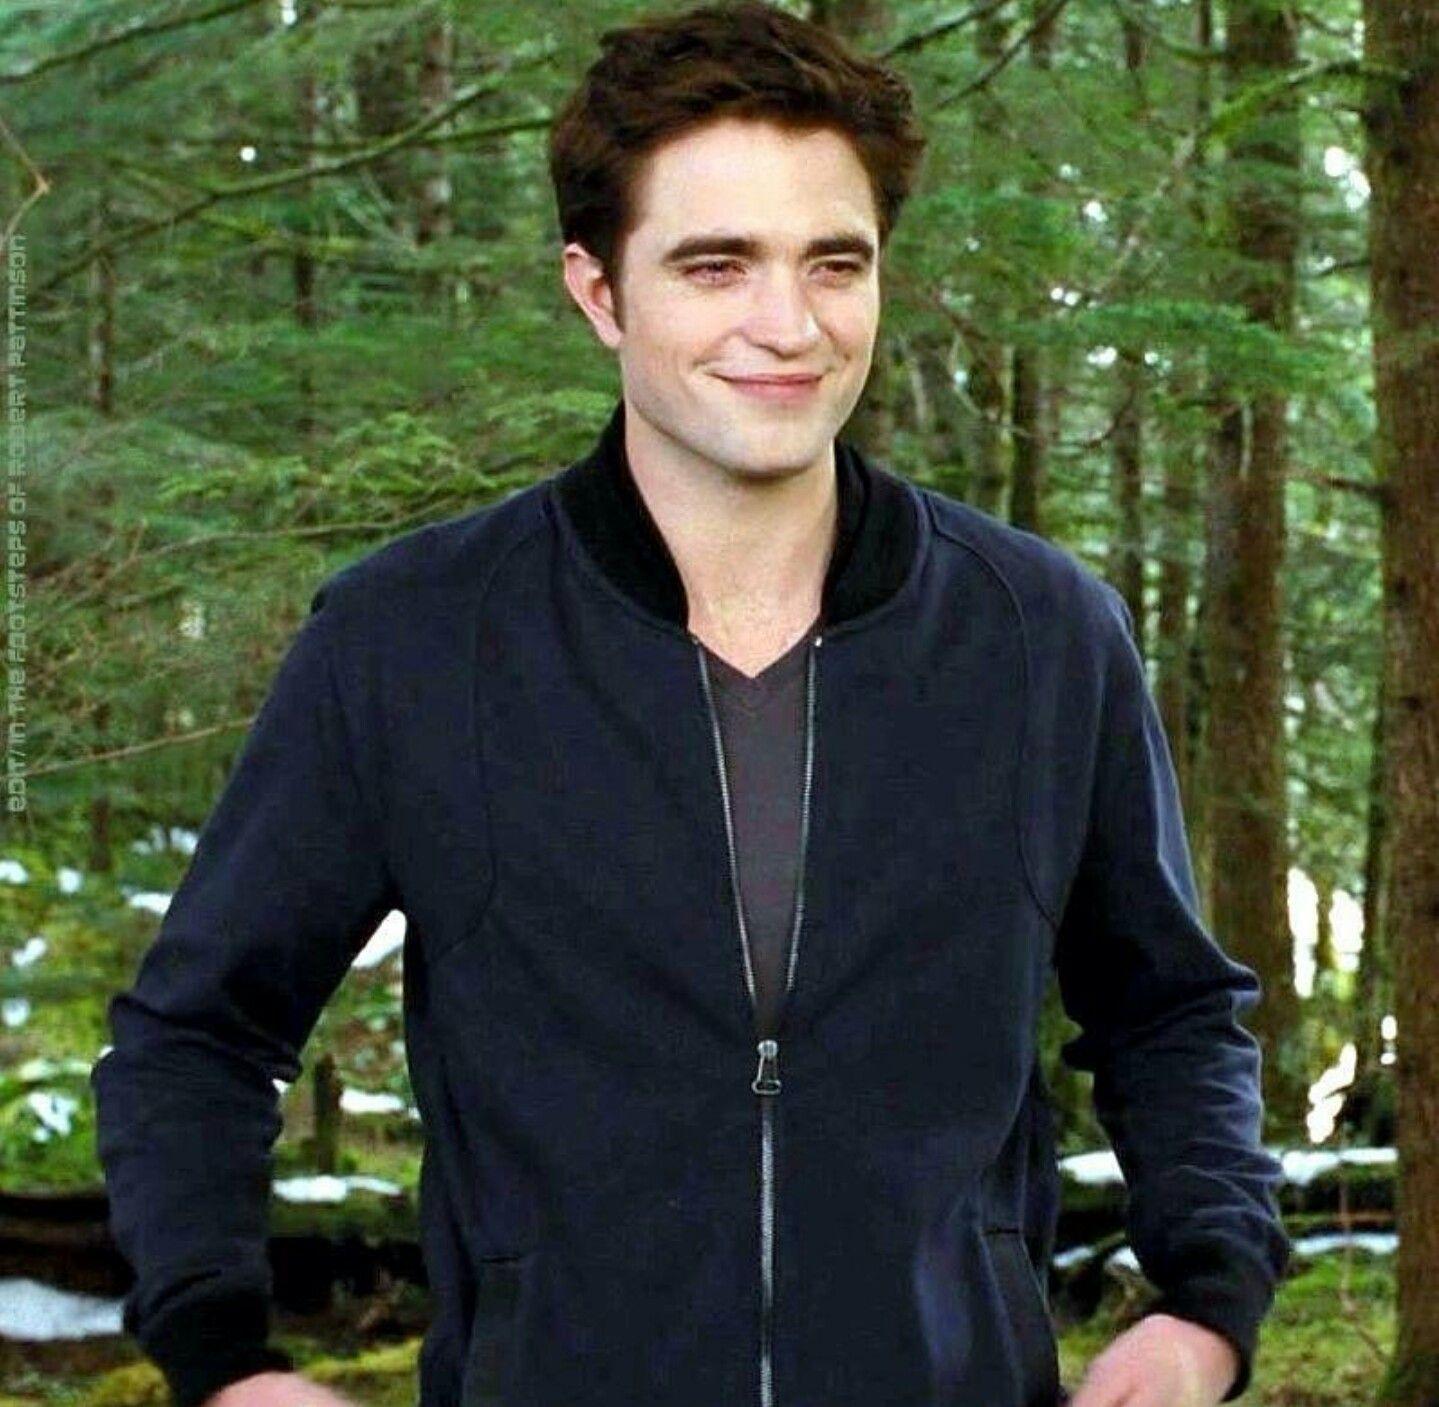 Robert Pattinson dating leven INTJ dating esfp